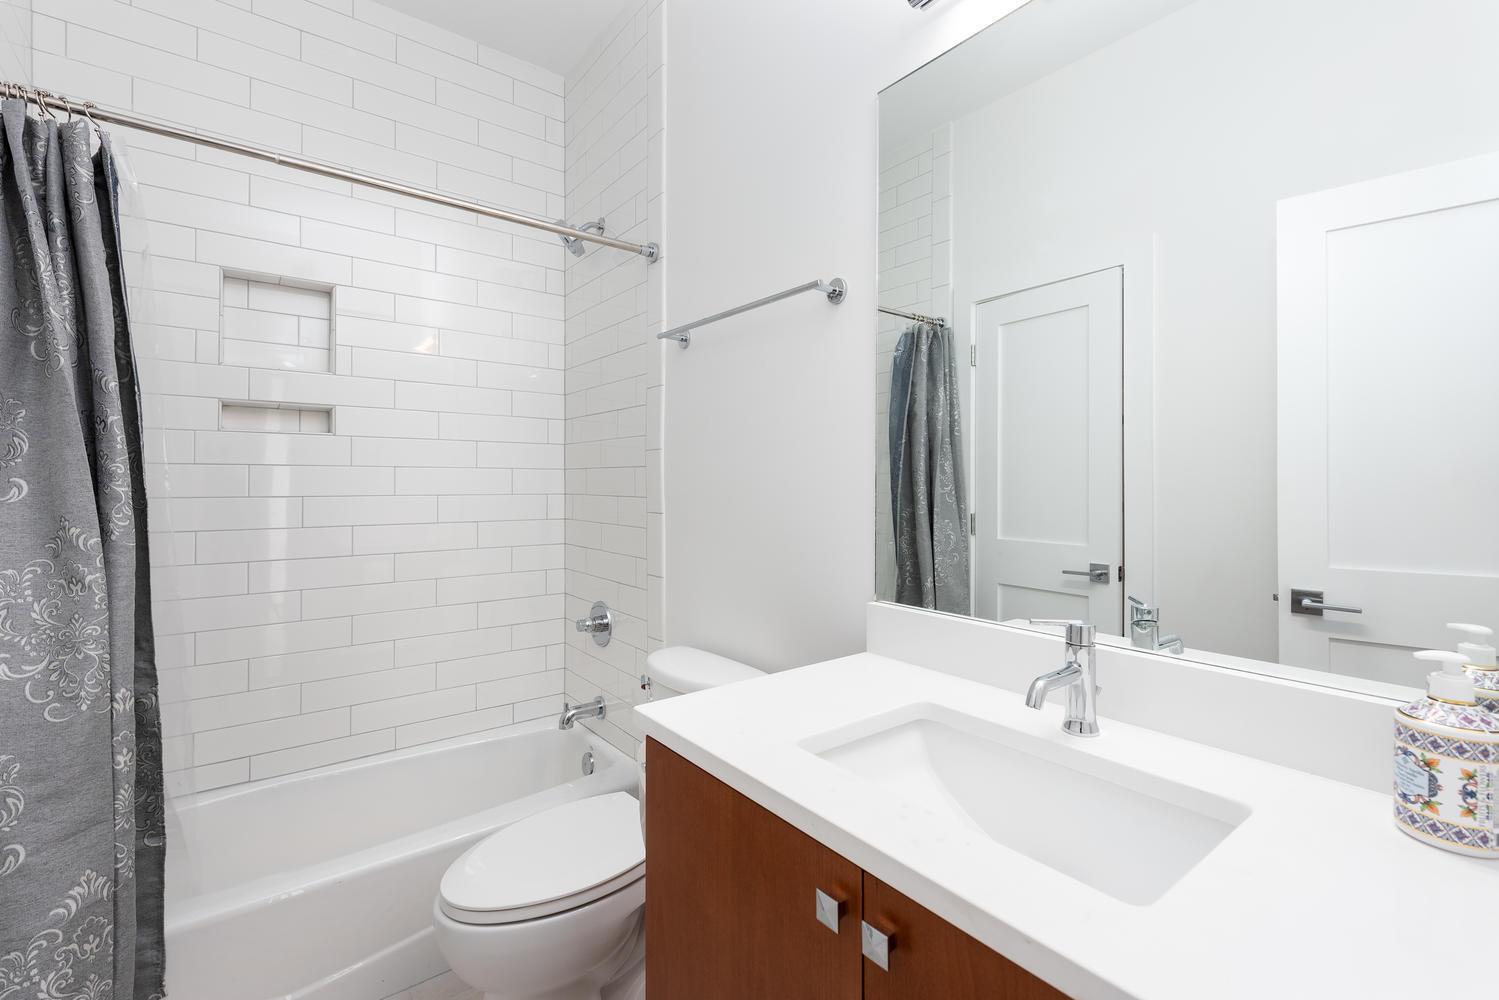 Cannonborough-Elliottborough Homes For Sale - 92 Spring, Charleston, SC - 0